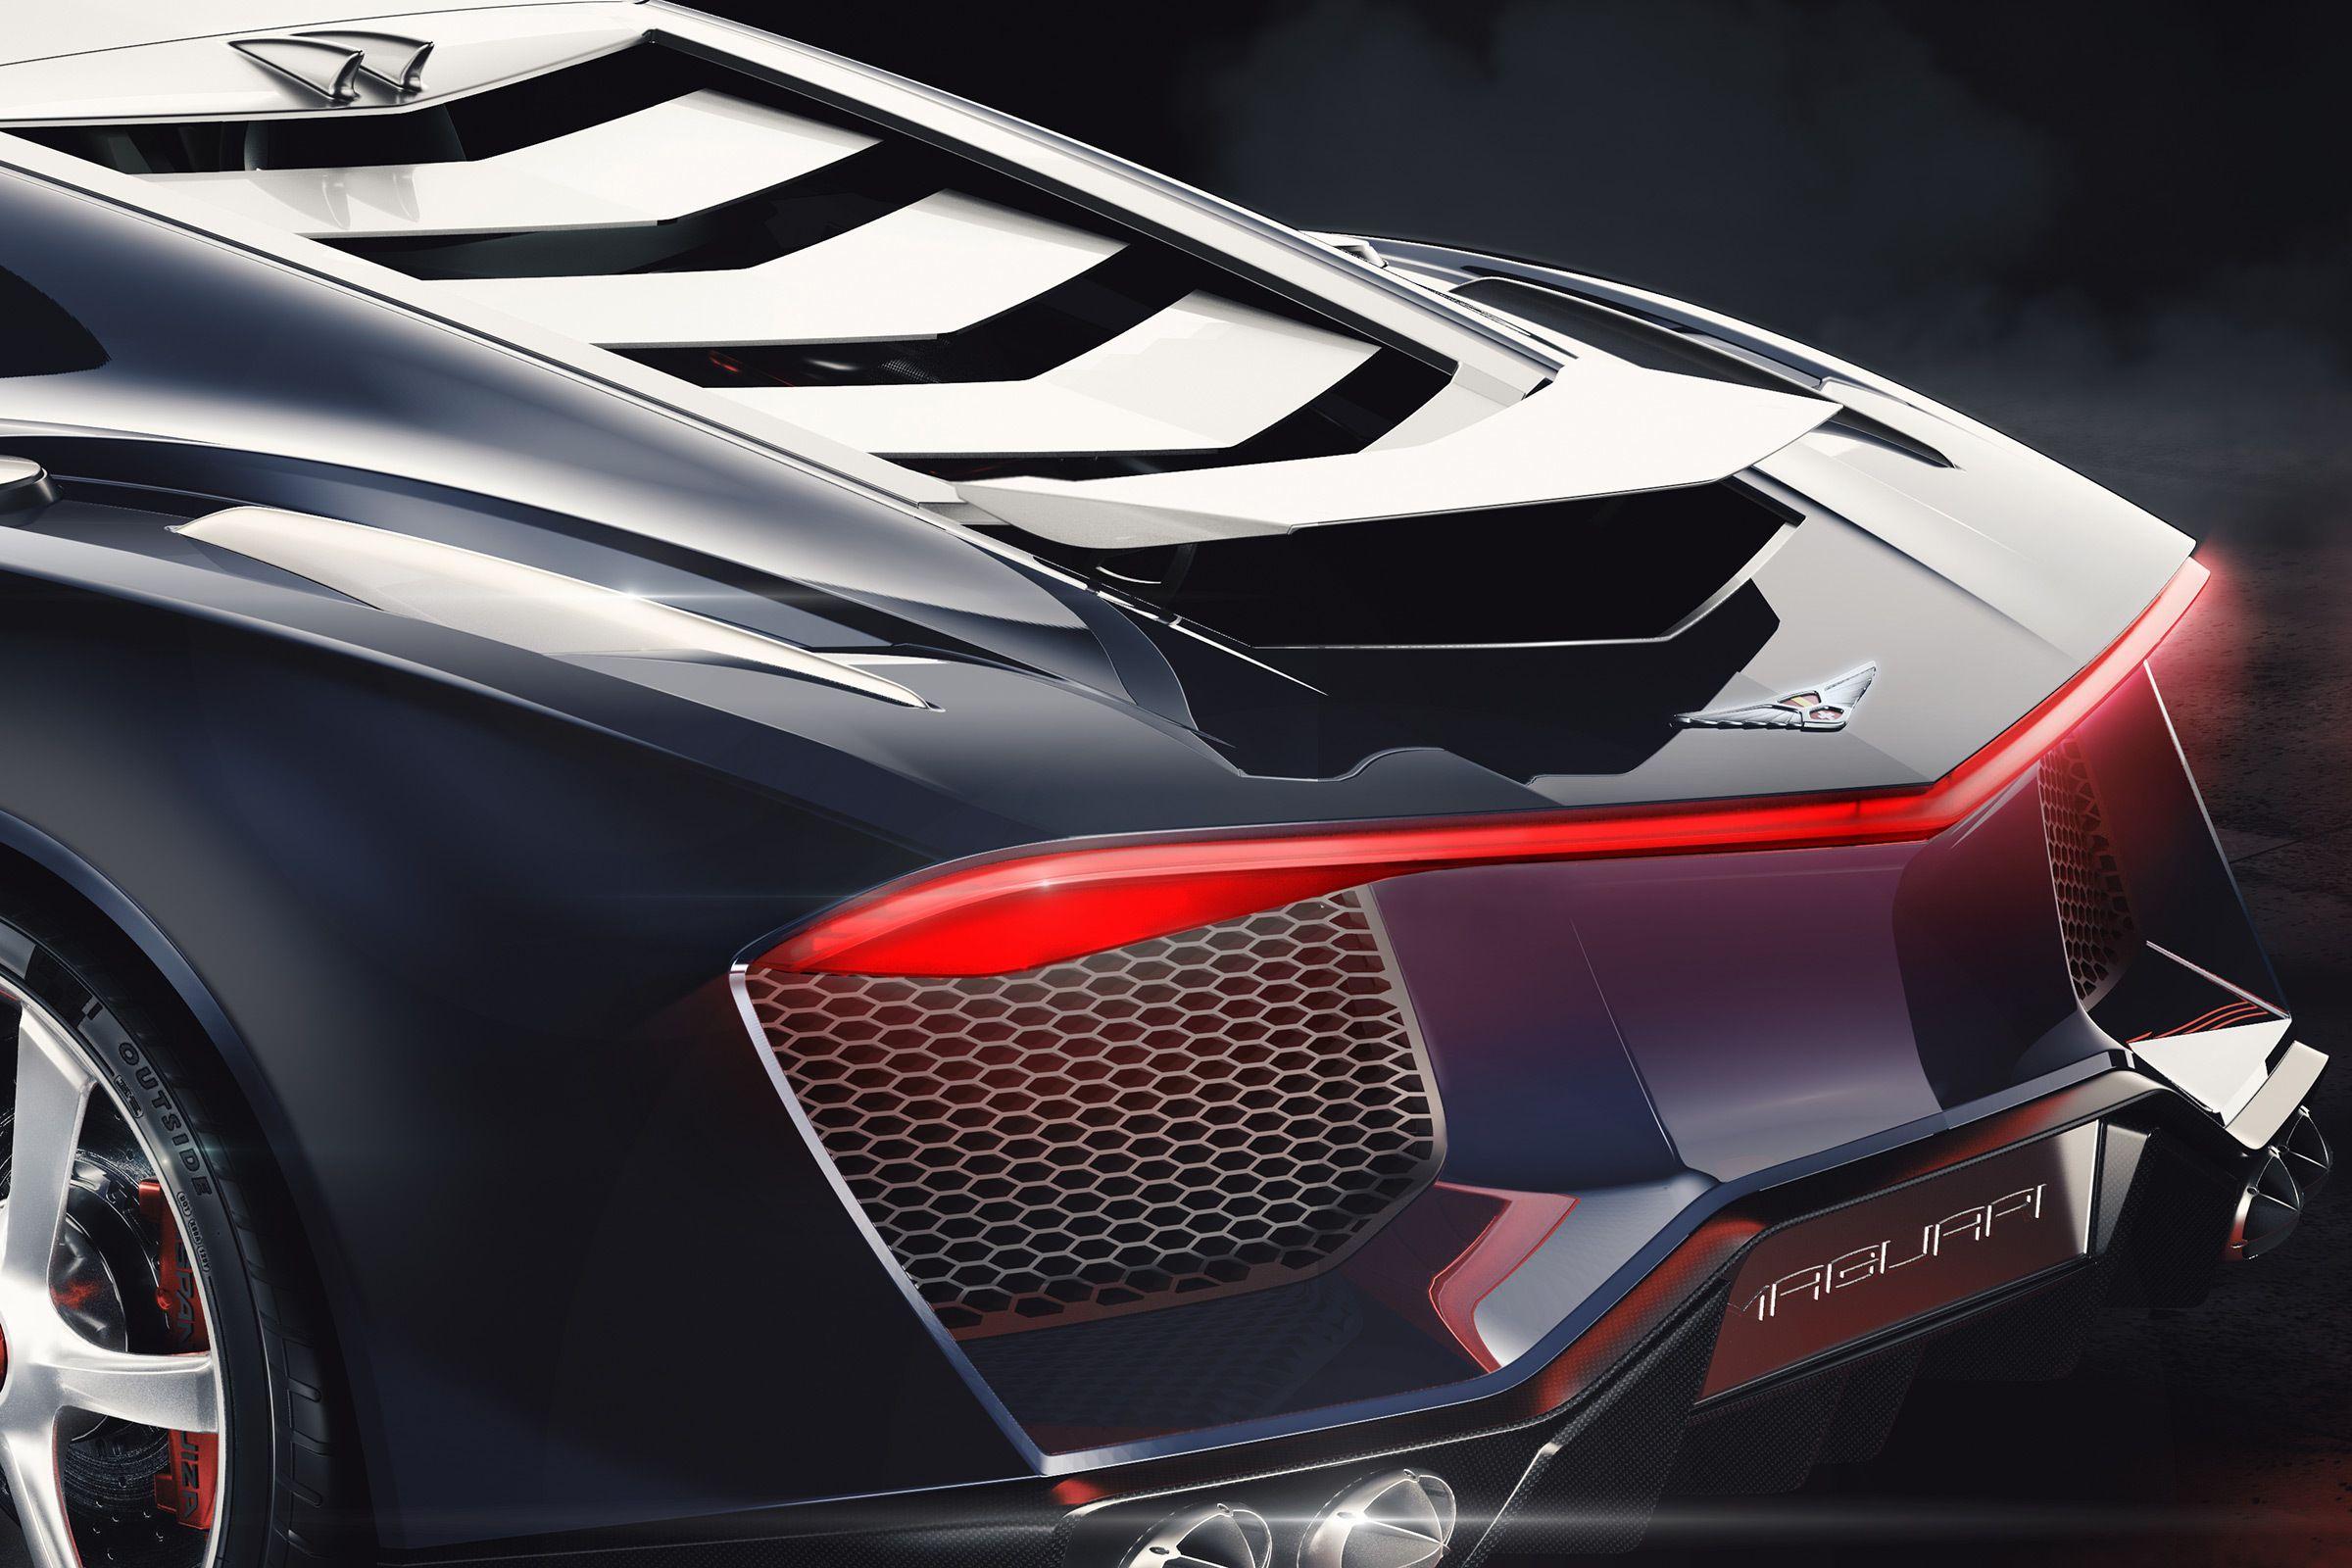 Гіперкар Hispano Suiza Maguari складе конкуренцію Hispano Suiza Carmen